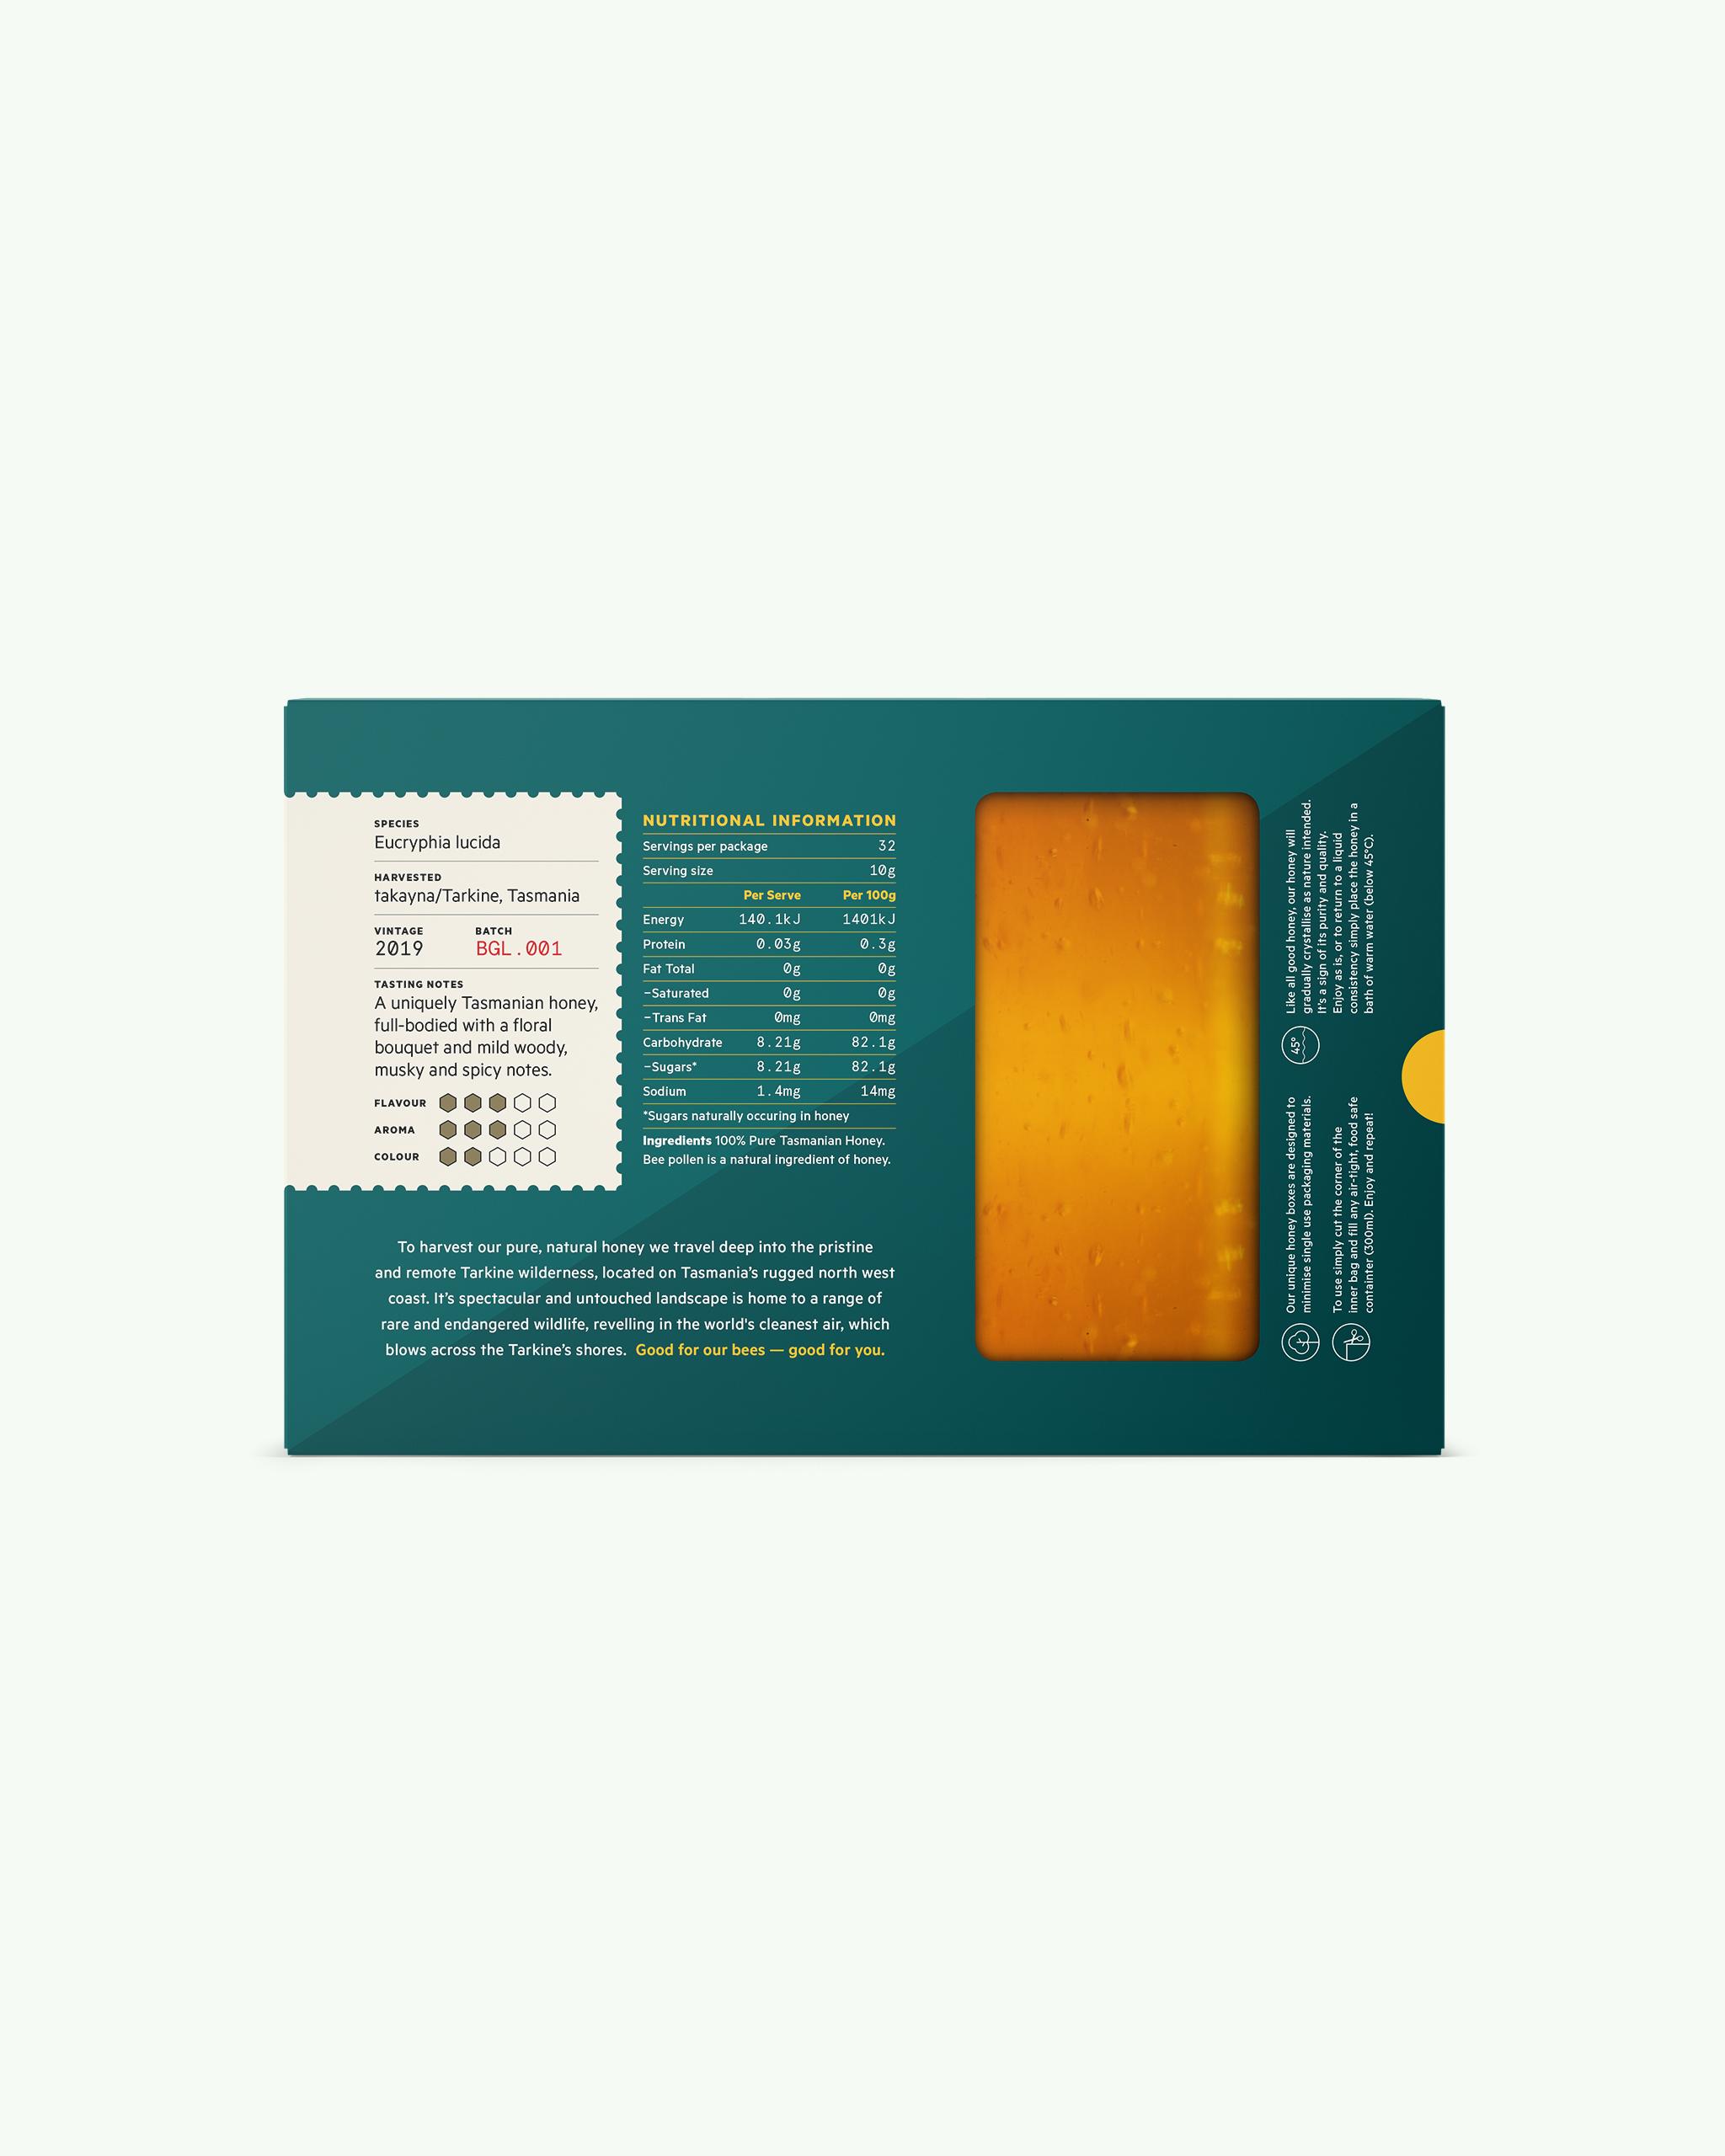 leatherwood-box-2.jpg